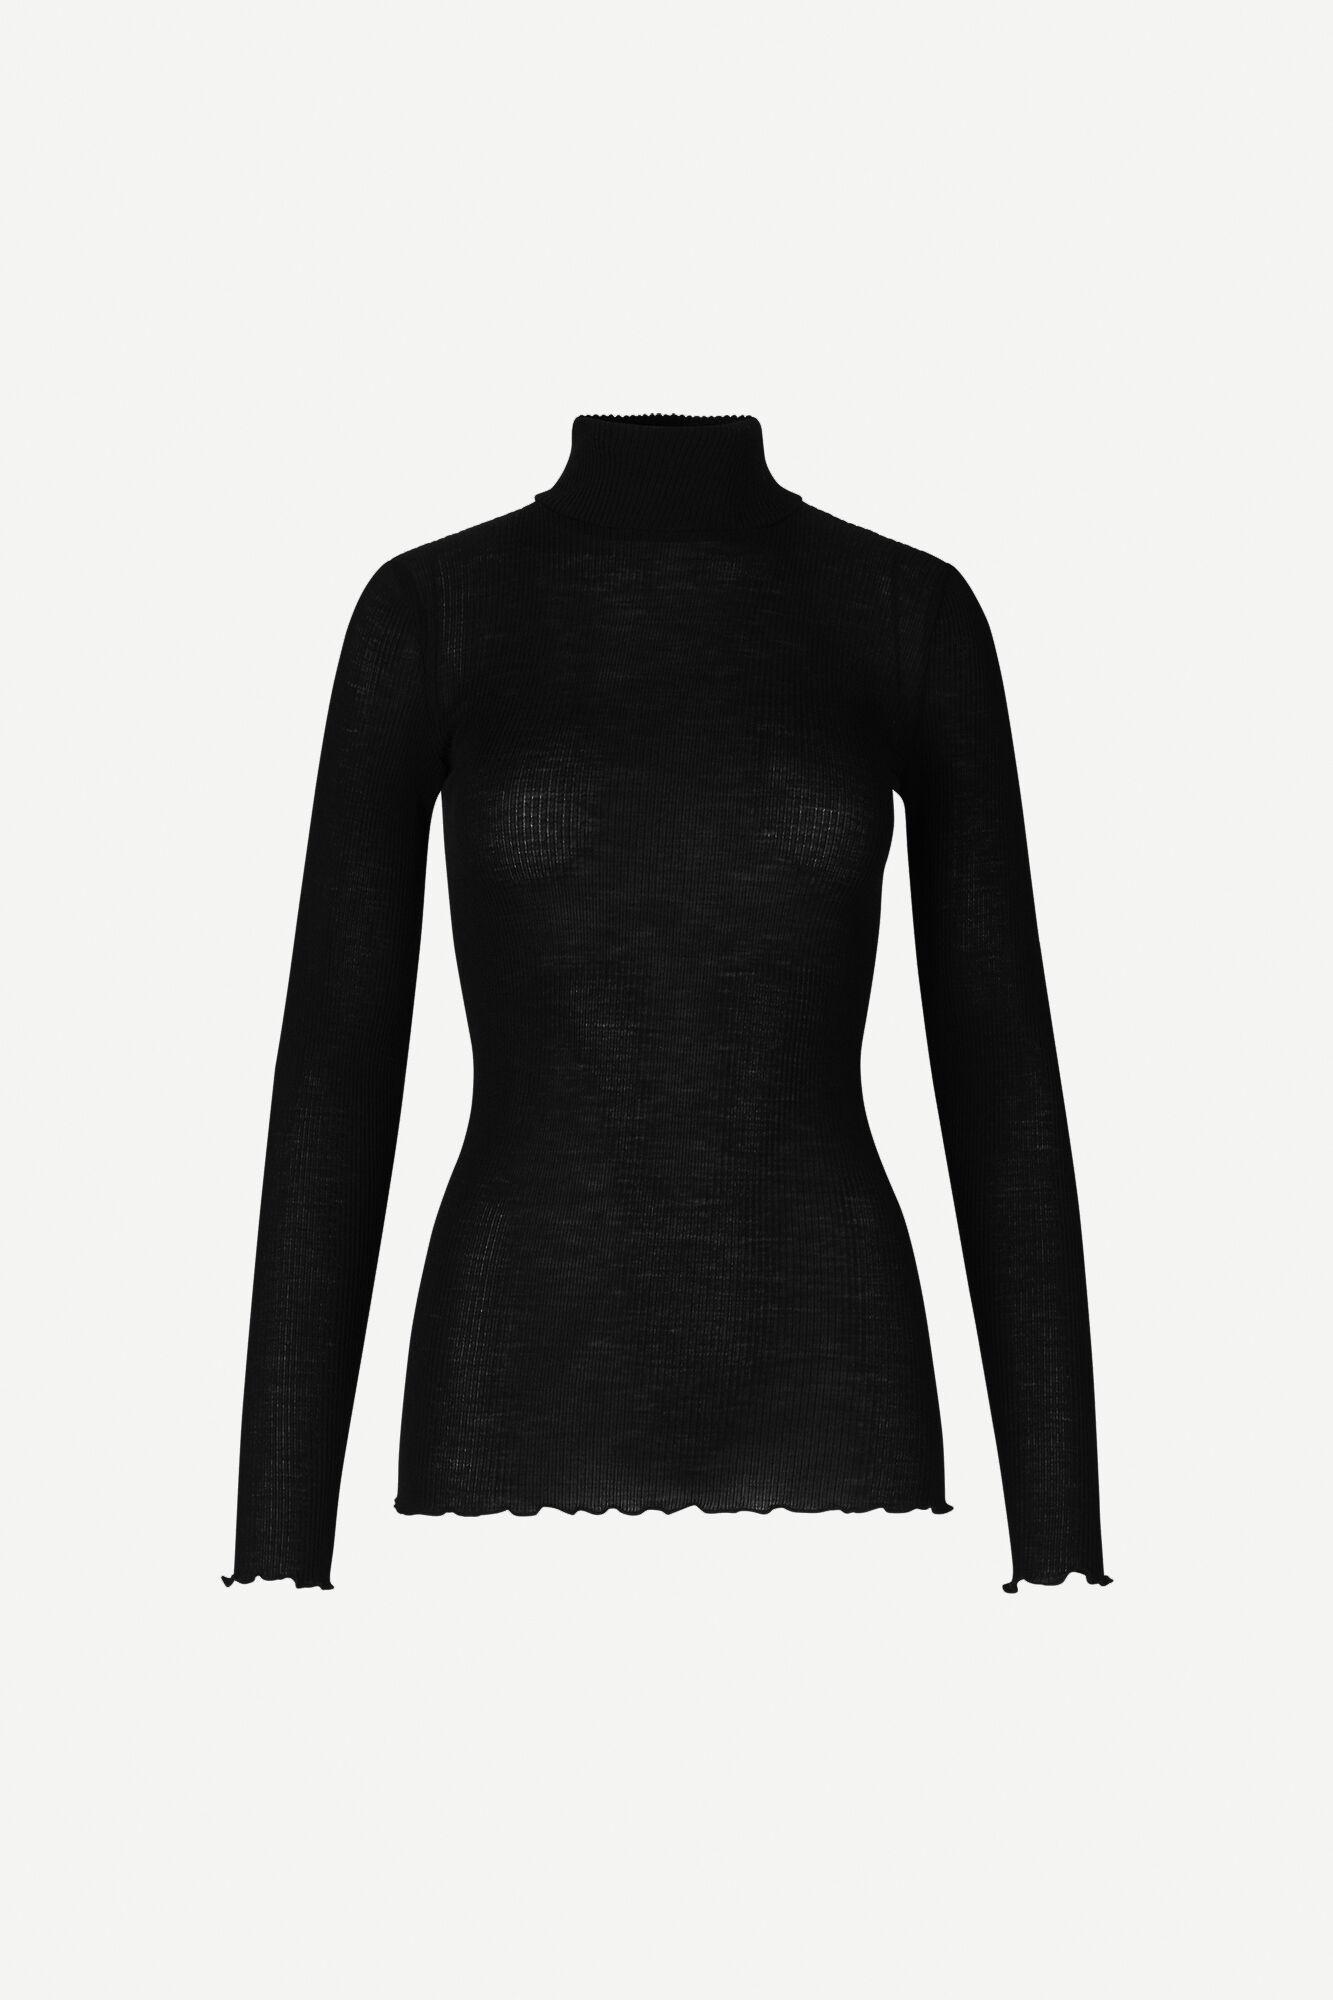 Cupidon t-n t-shirt ls 13020, BLACK